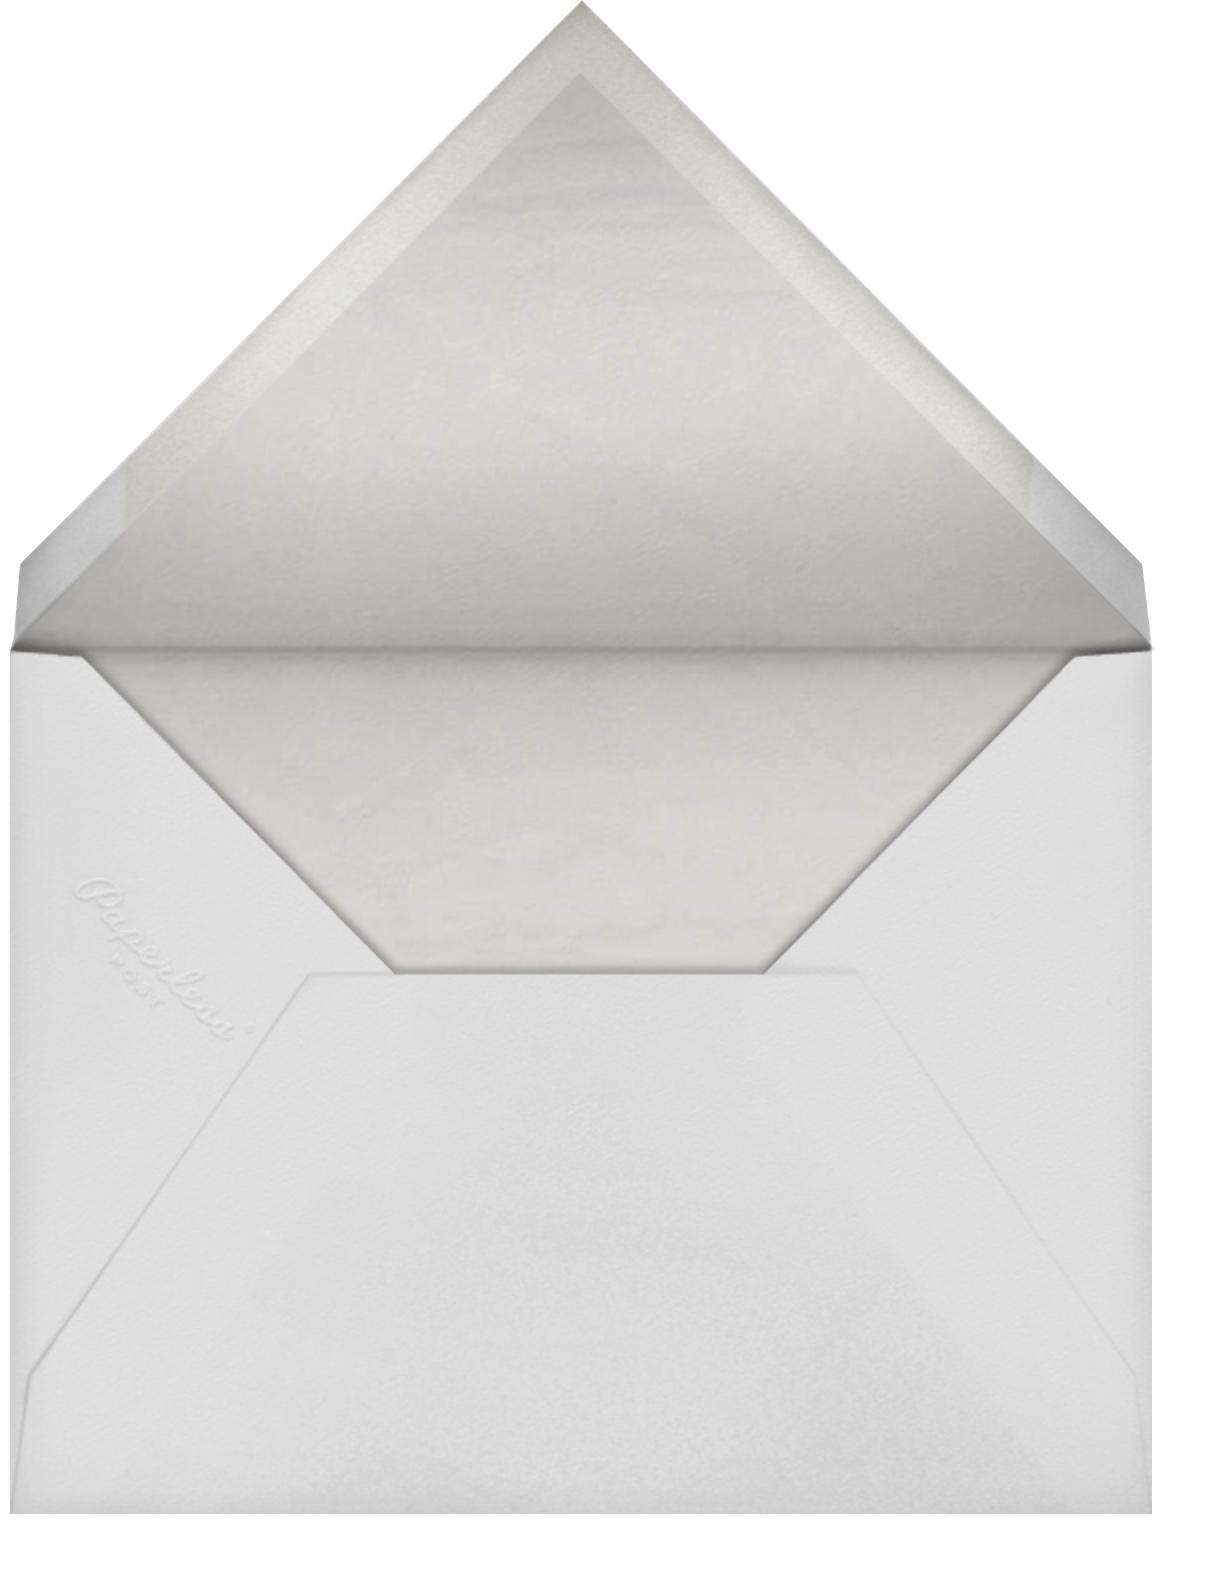 Damask - Ivory Blind Embossed (Border) - Paperless Post - Envelope